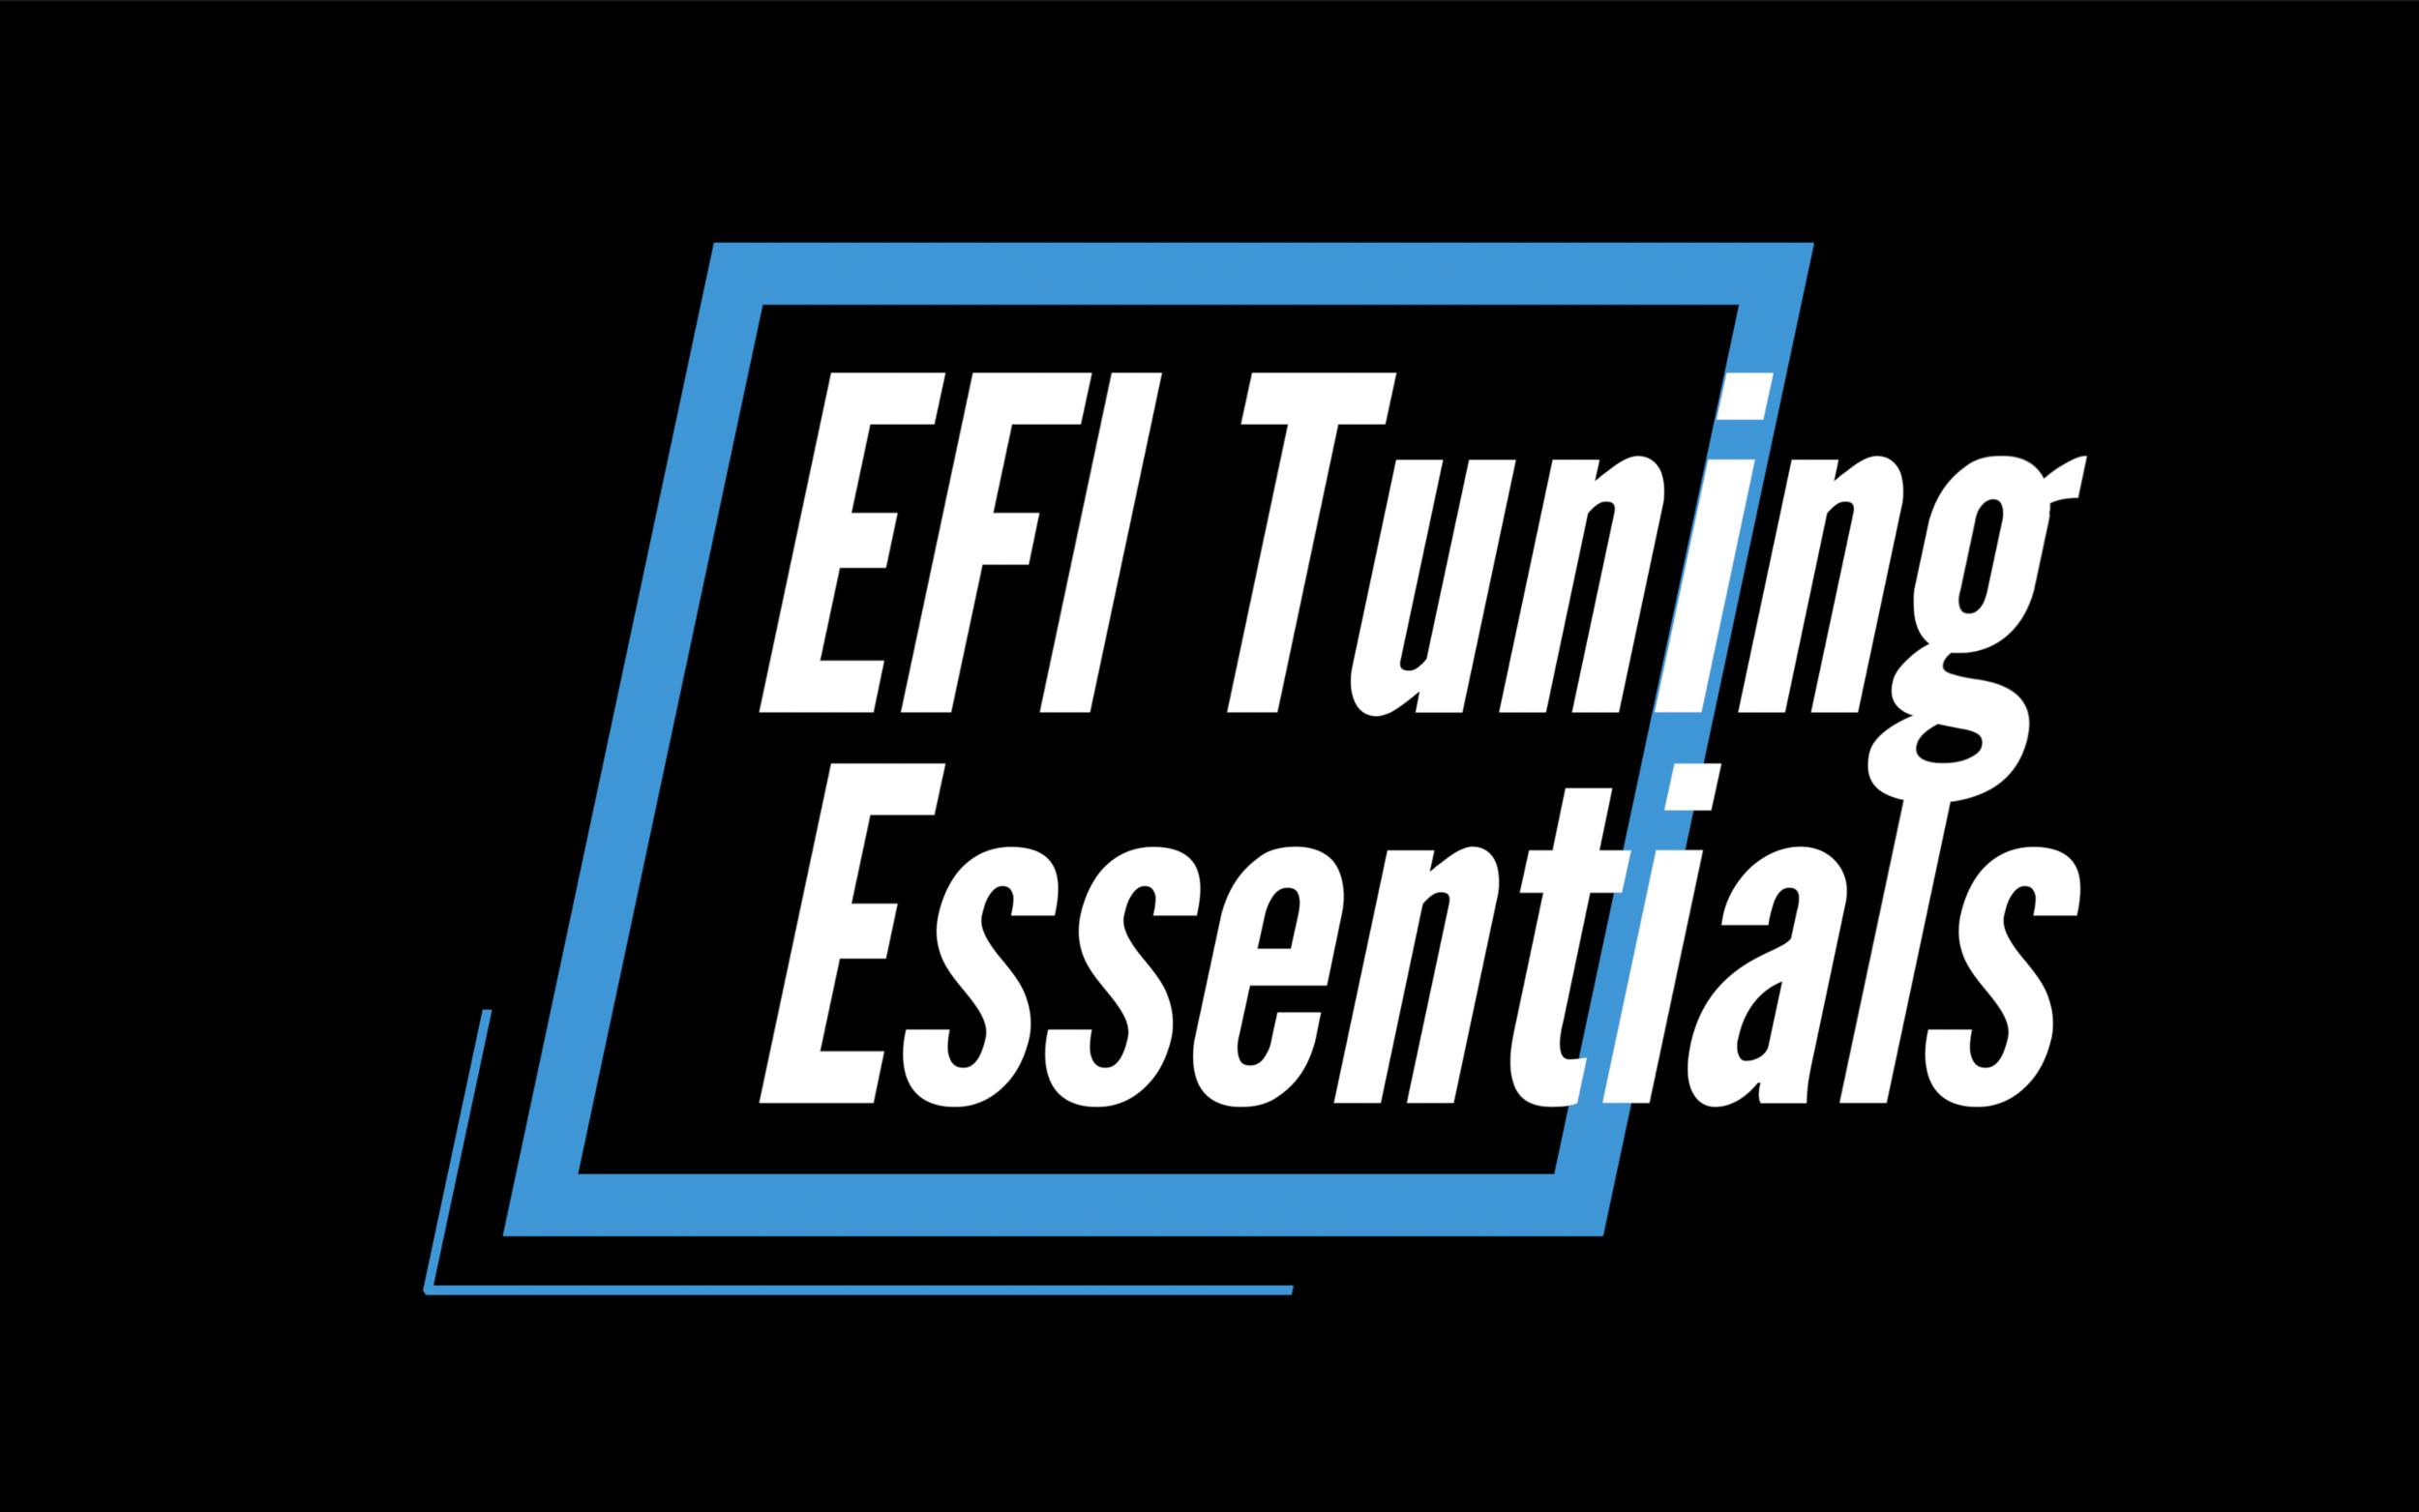 EFI Tuning Essentials .png